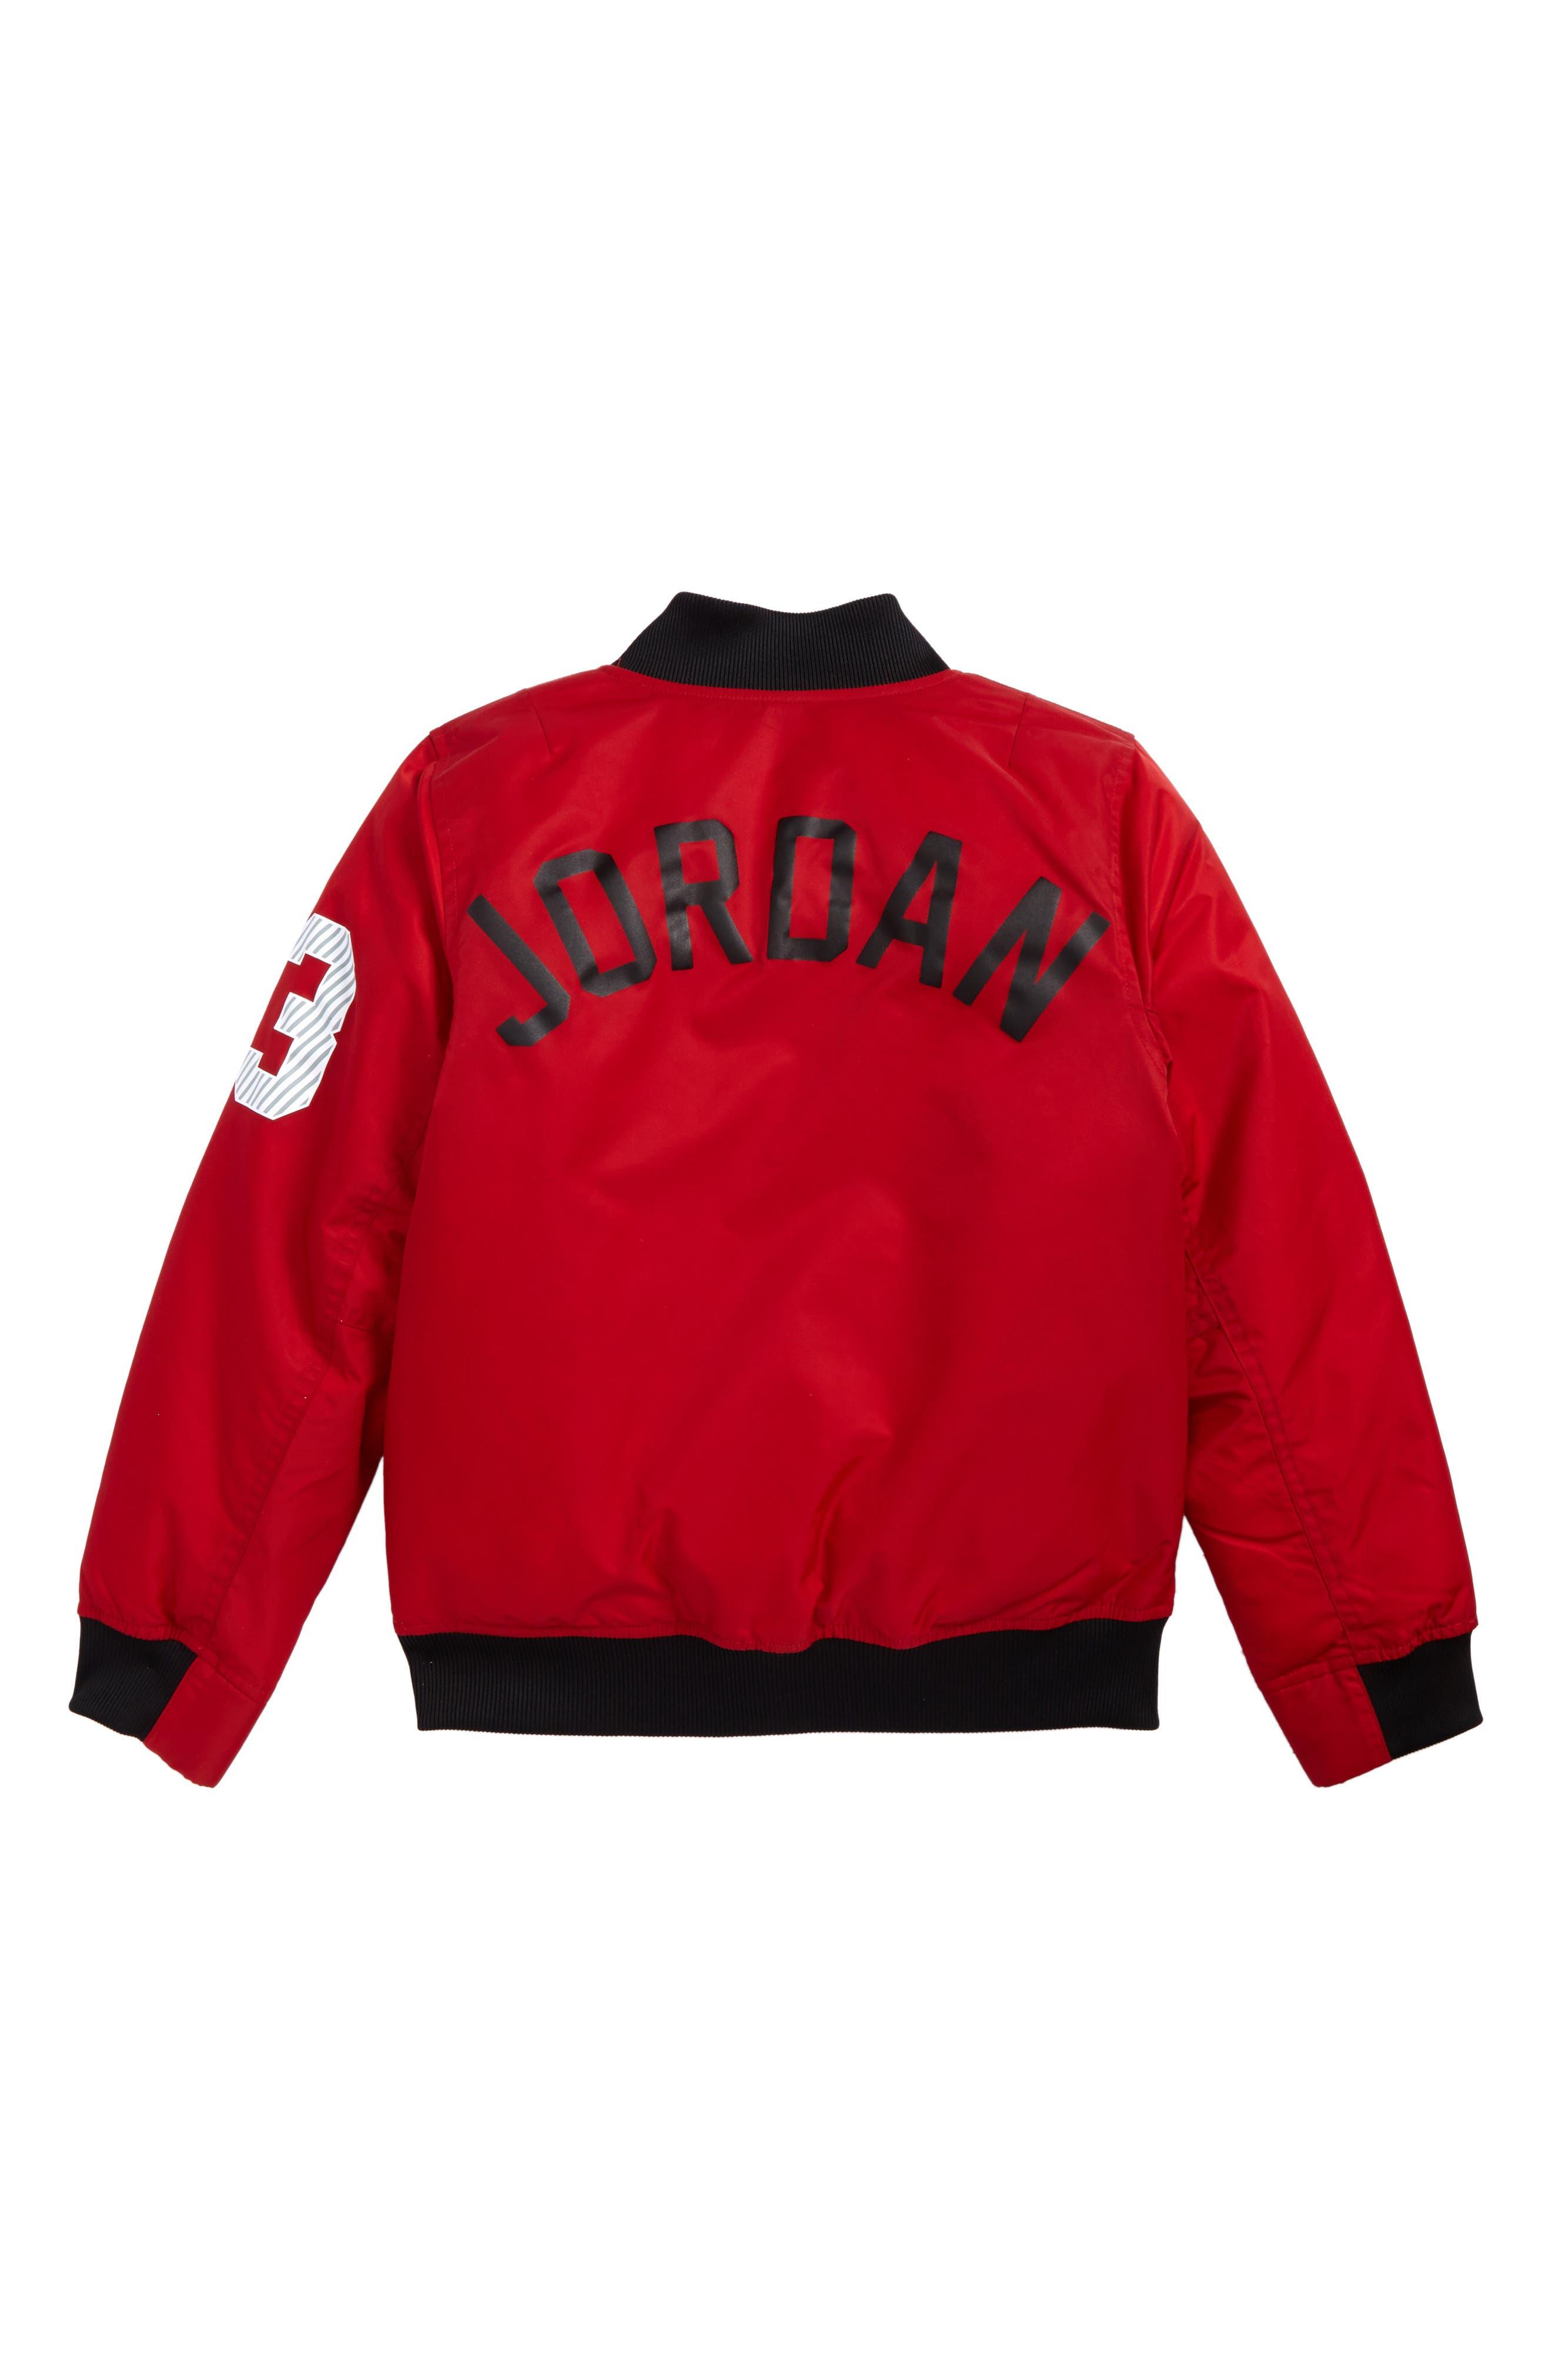 Jordan Fall in Line Jacket,                             Alternate thumbnail 2, color,                             Gym Red